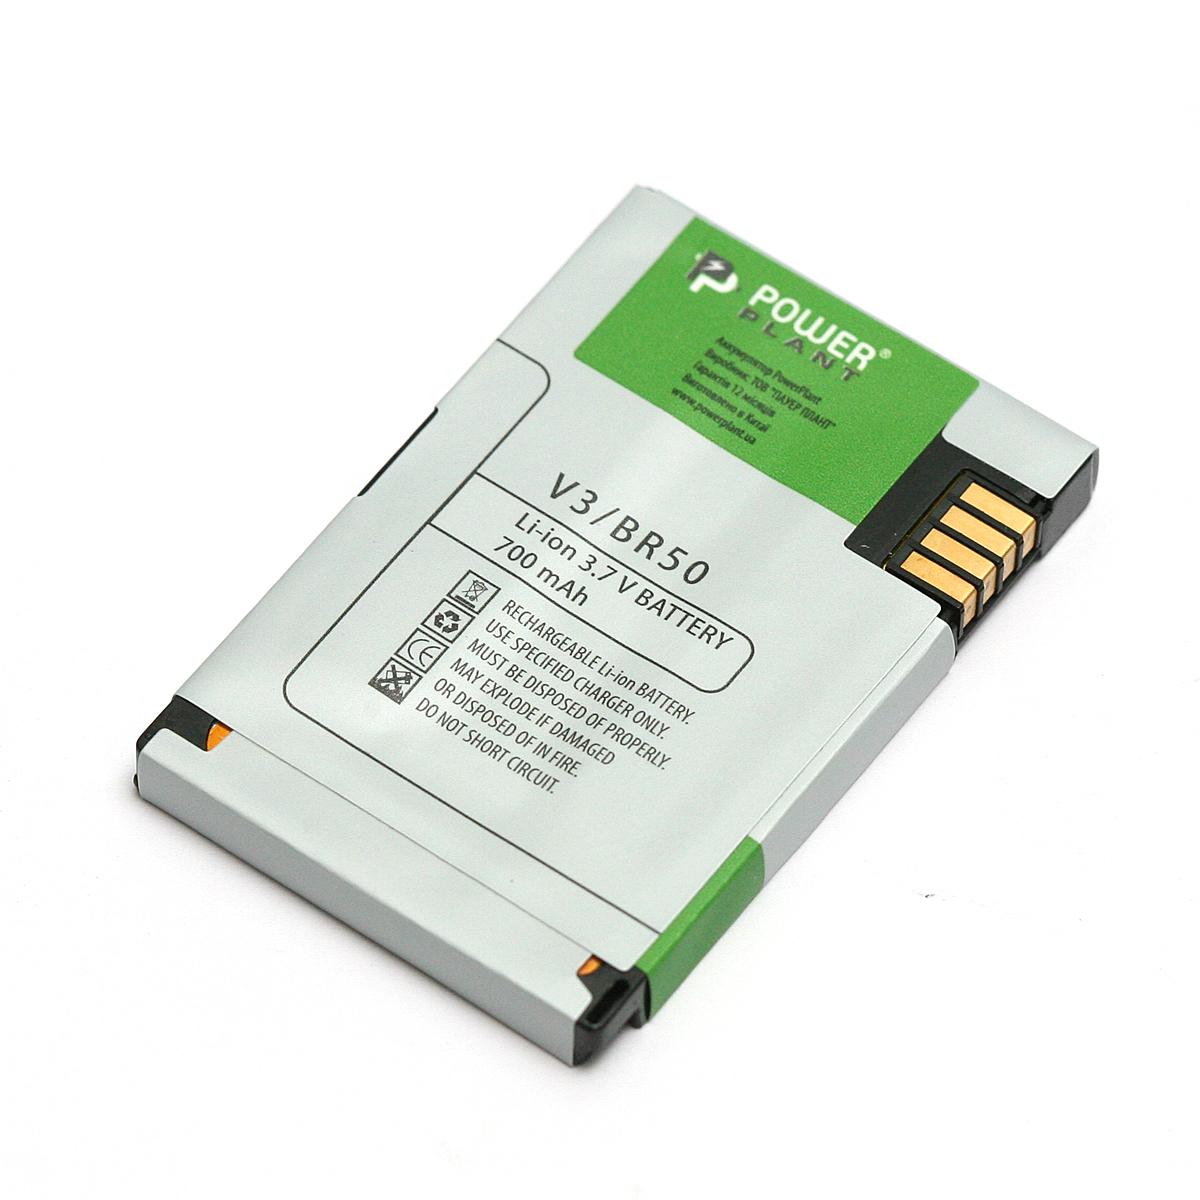 Купить Аккумулятор PowerPlant Motorola V3 (BR50) 700mAh